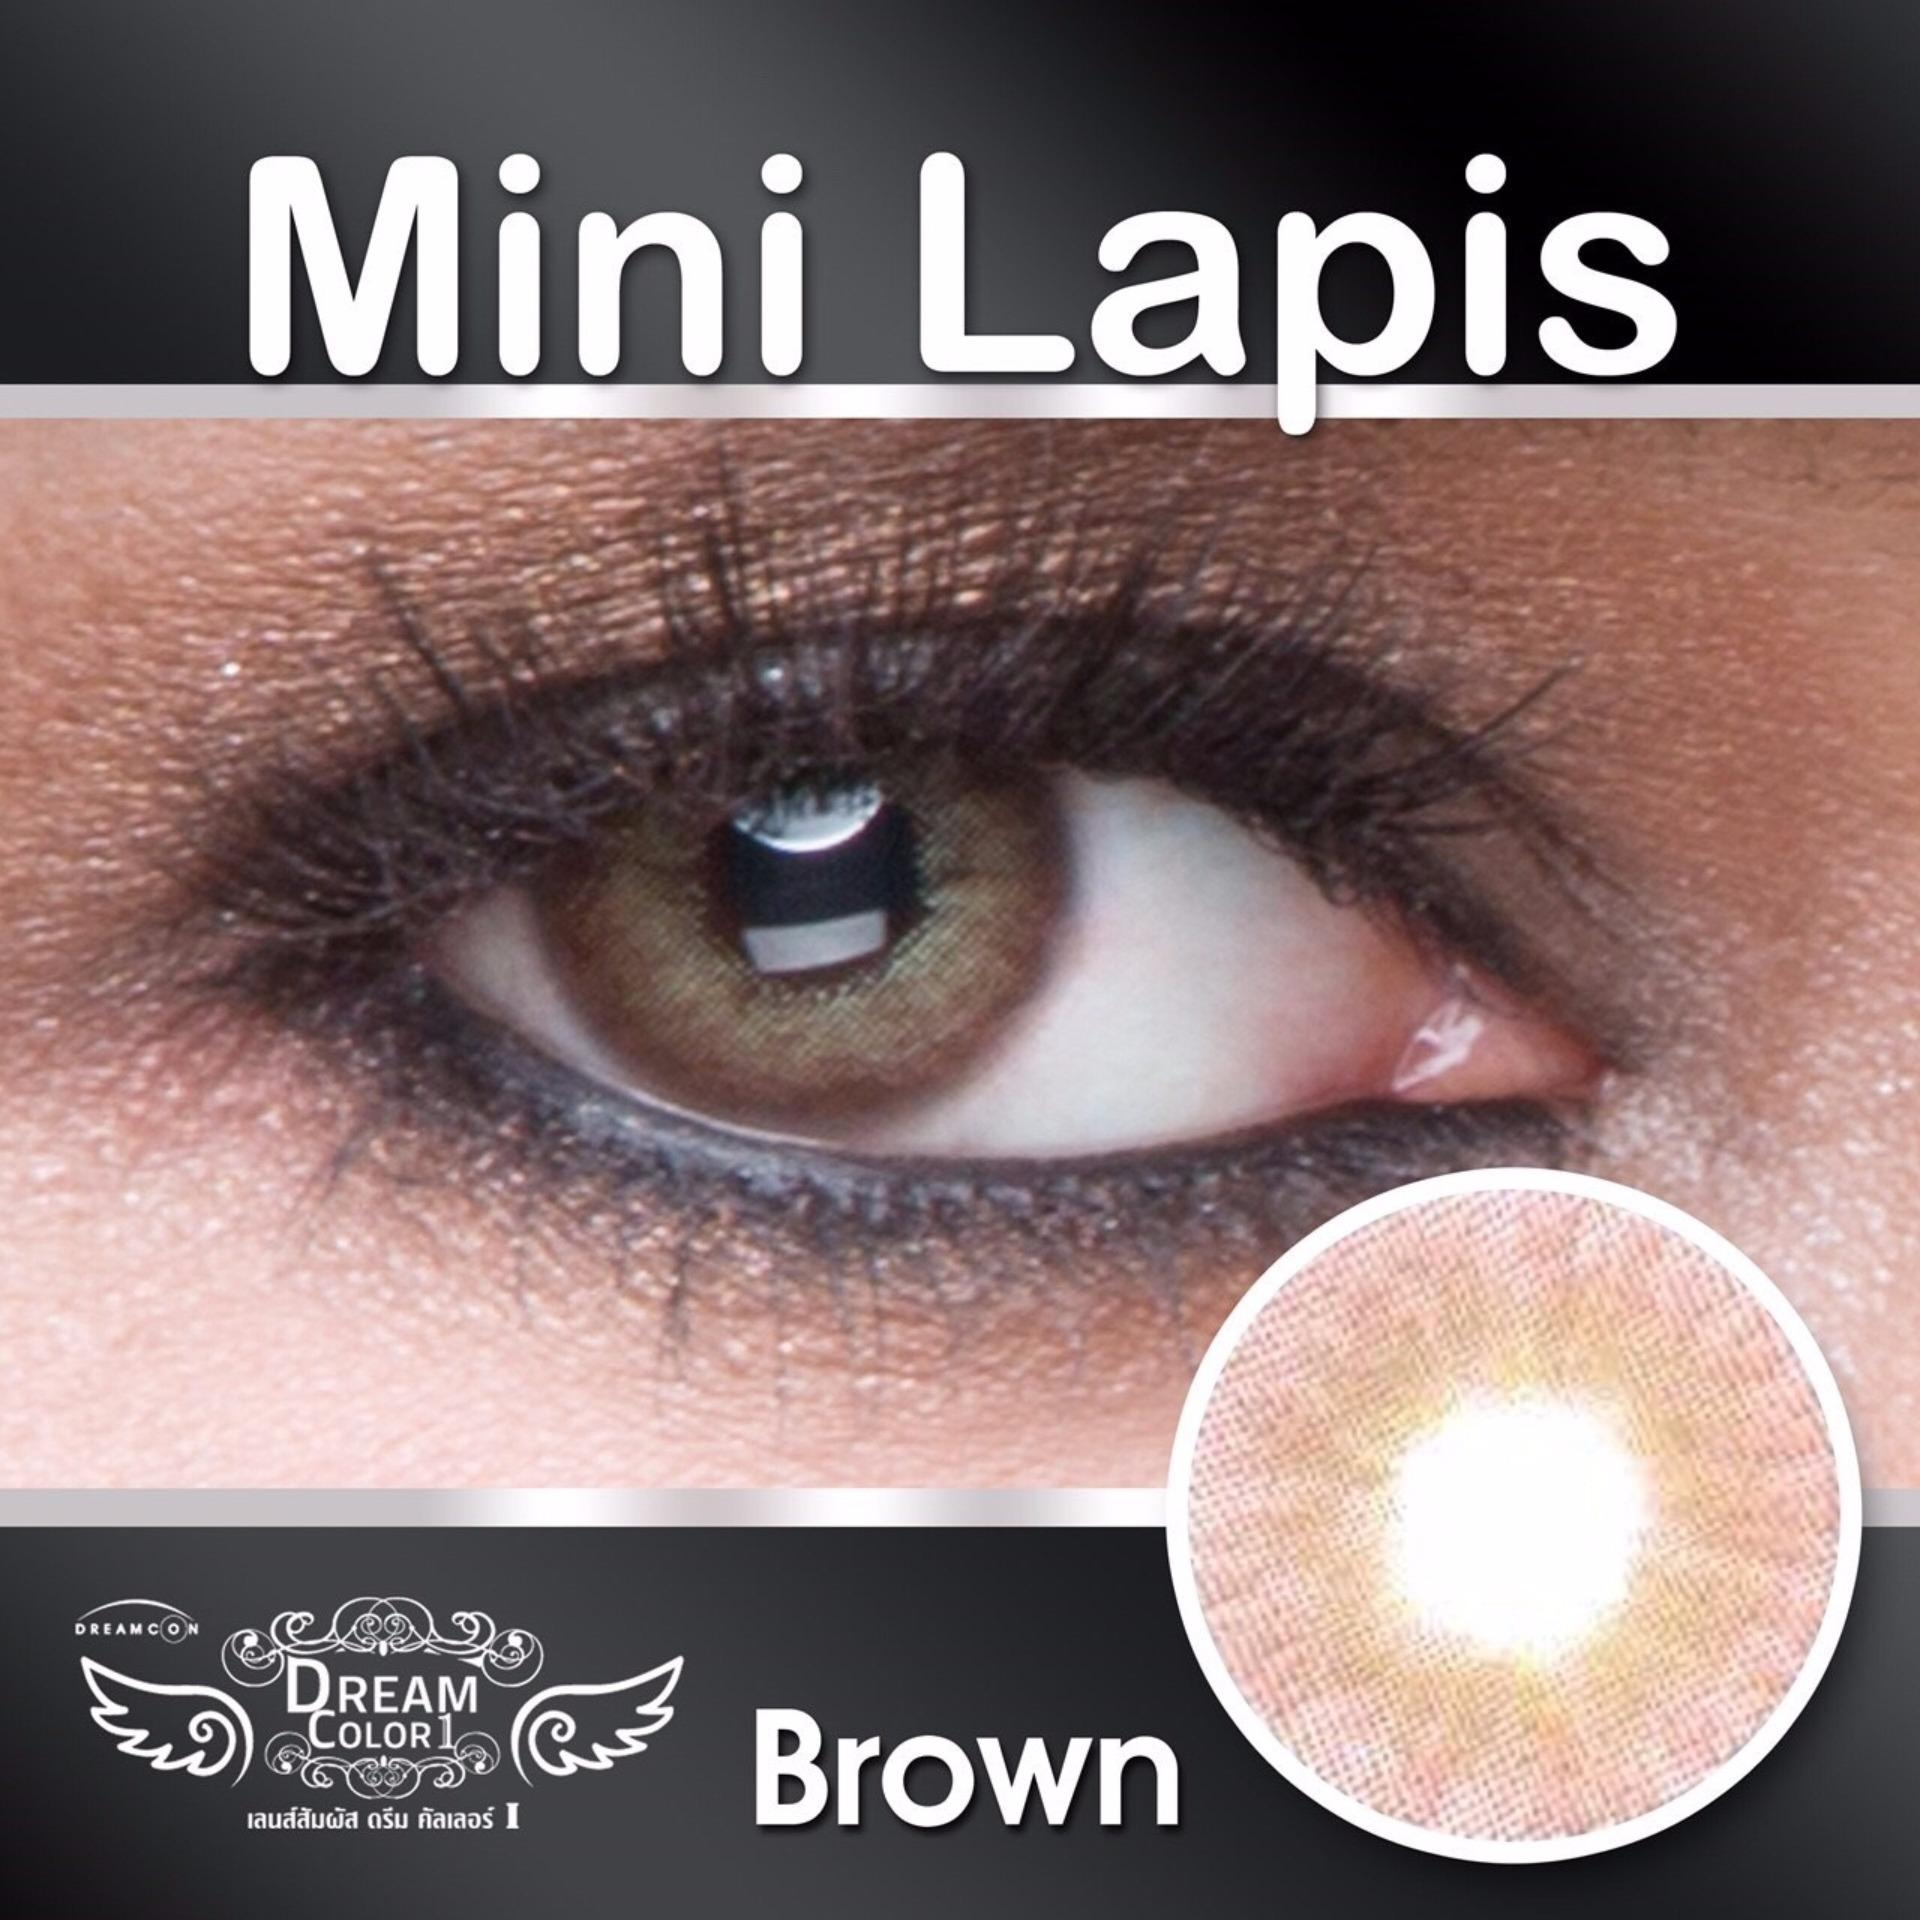 Softlens Dreamcolor Mini Lapis - Brown - Gratis Lens Case